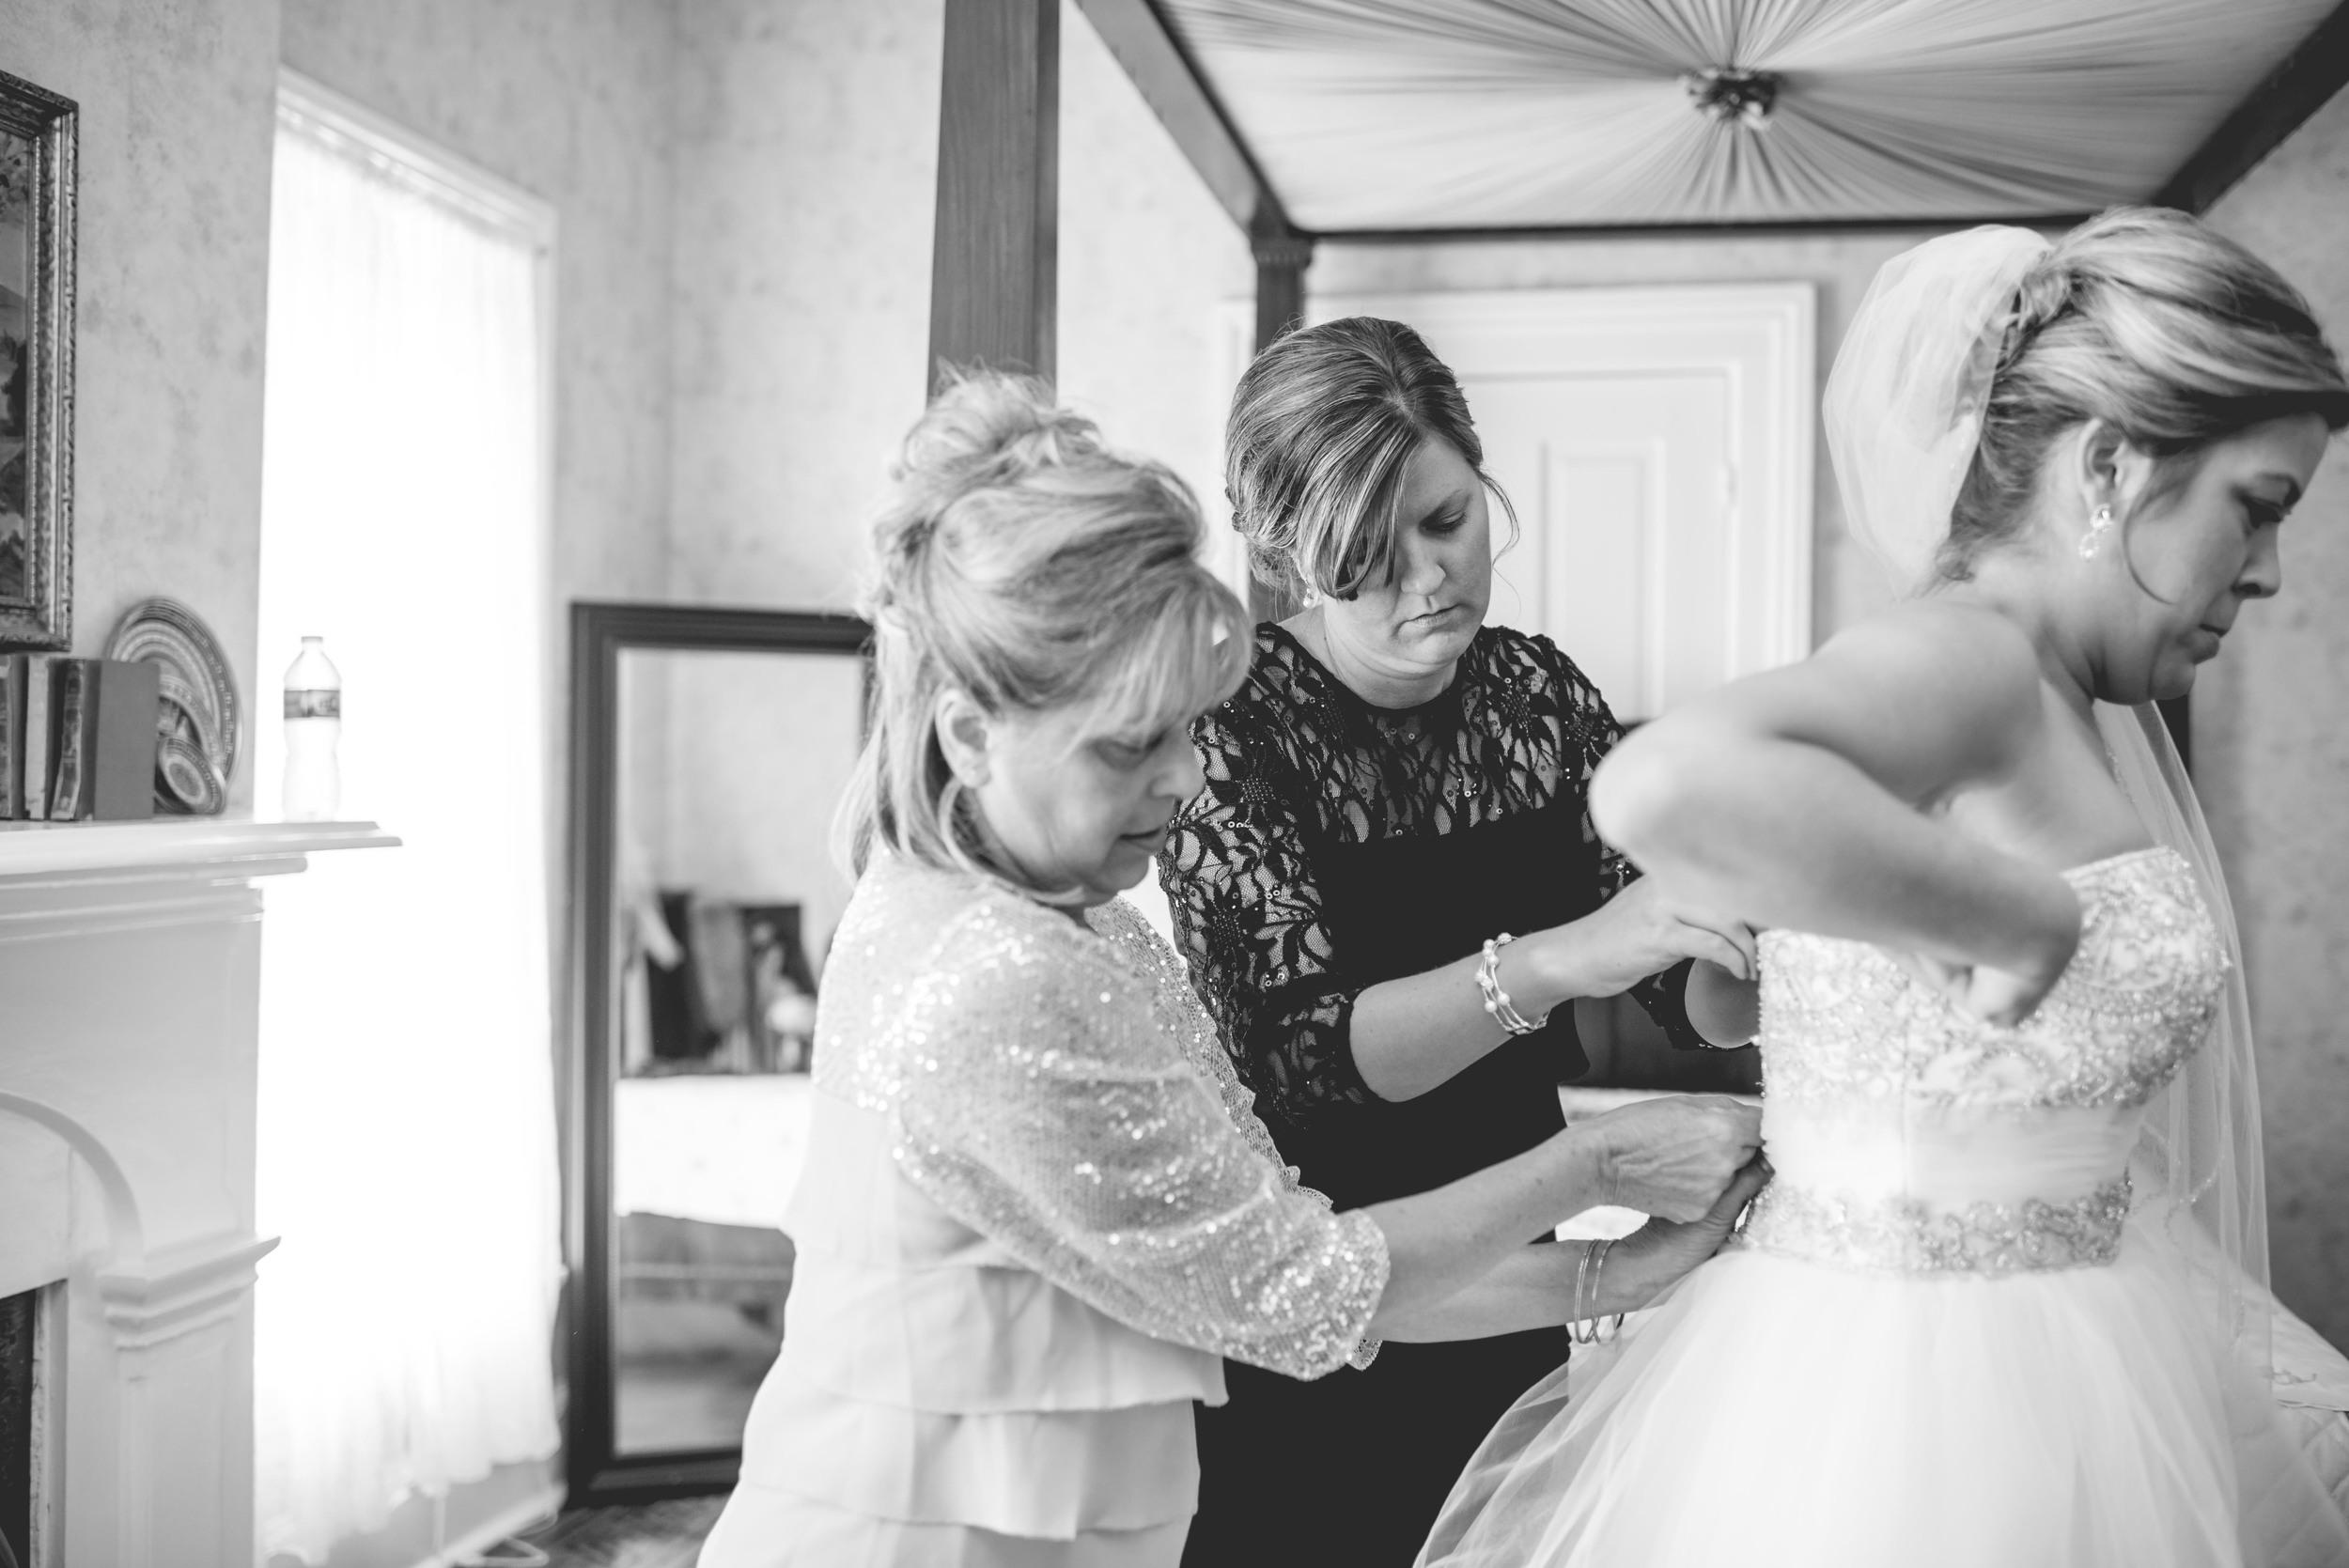 sarasutterphotography_leeandshalon_wedding_2015-98.jpg